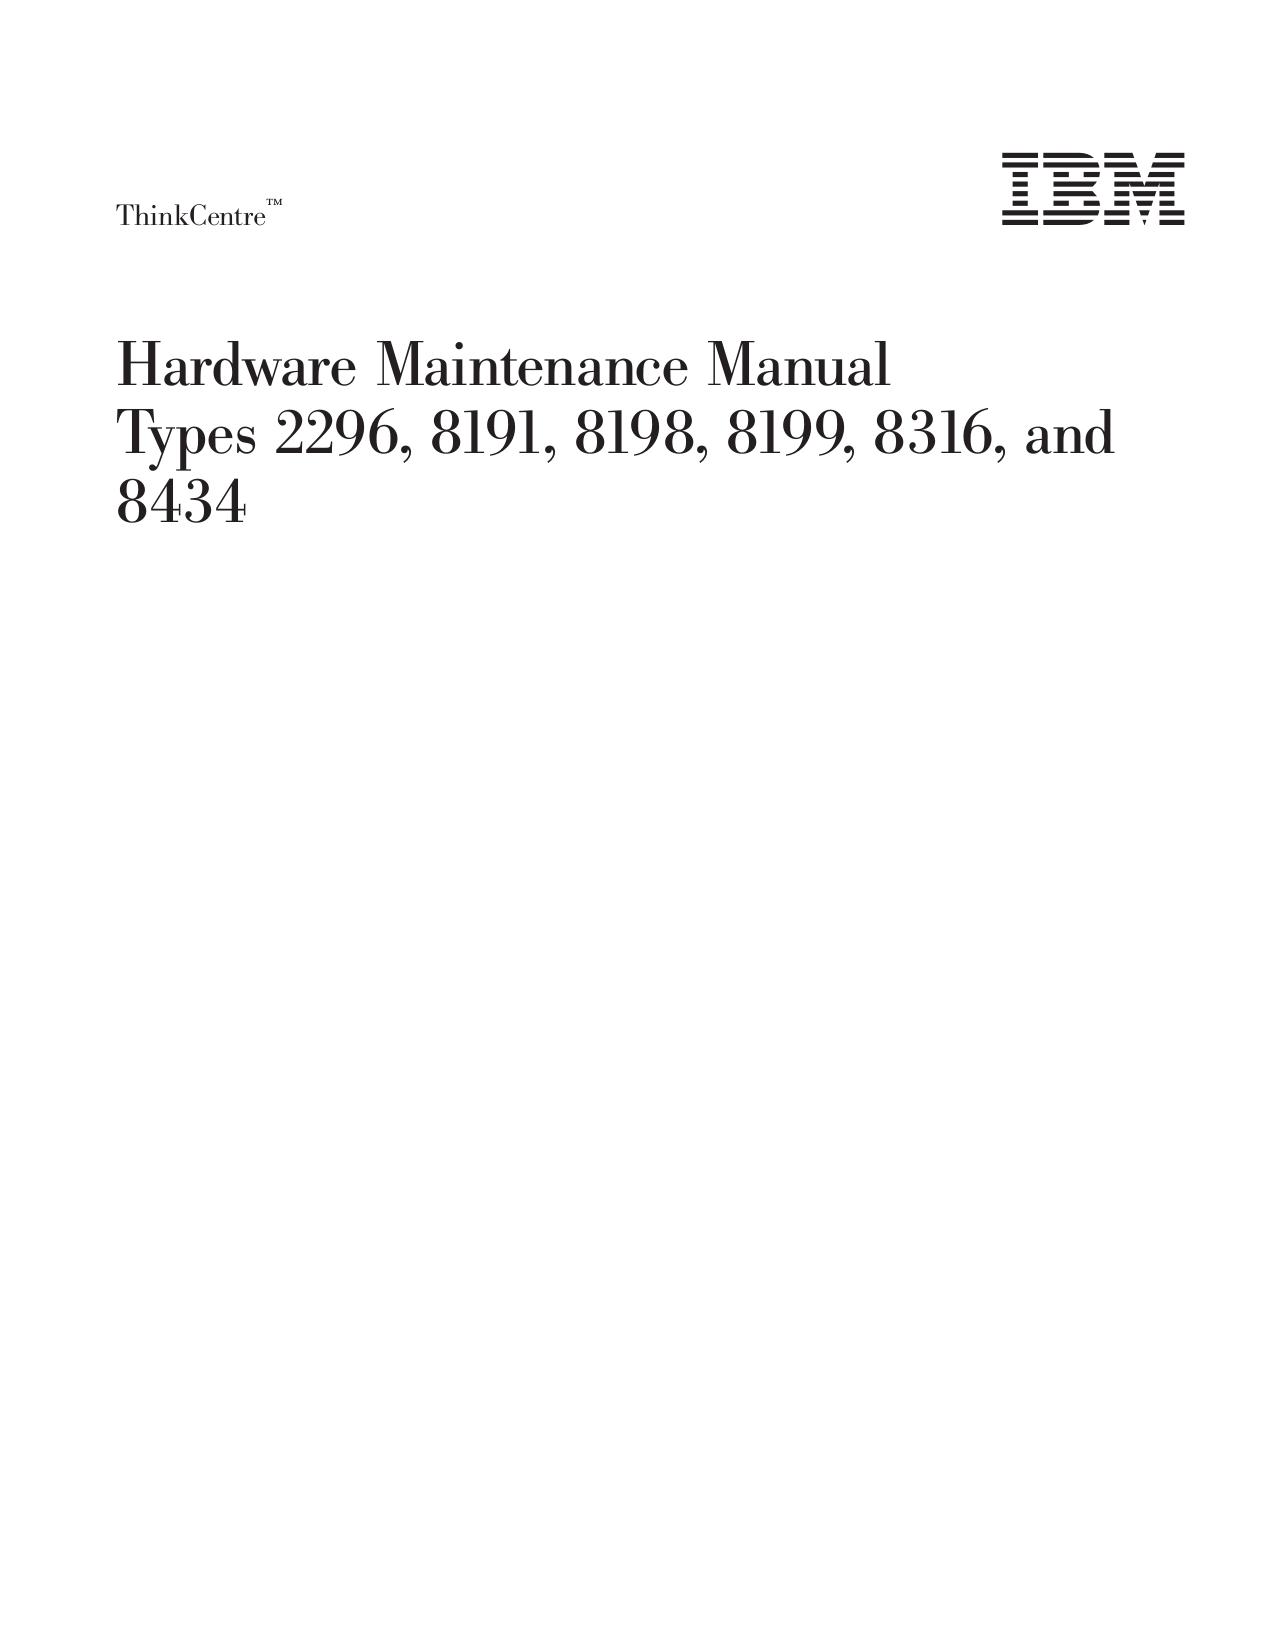 pdf for Lenovo Desktop ThinkCentre A30 8191 manual